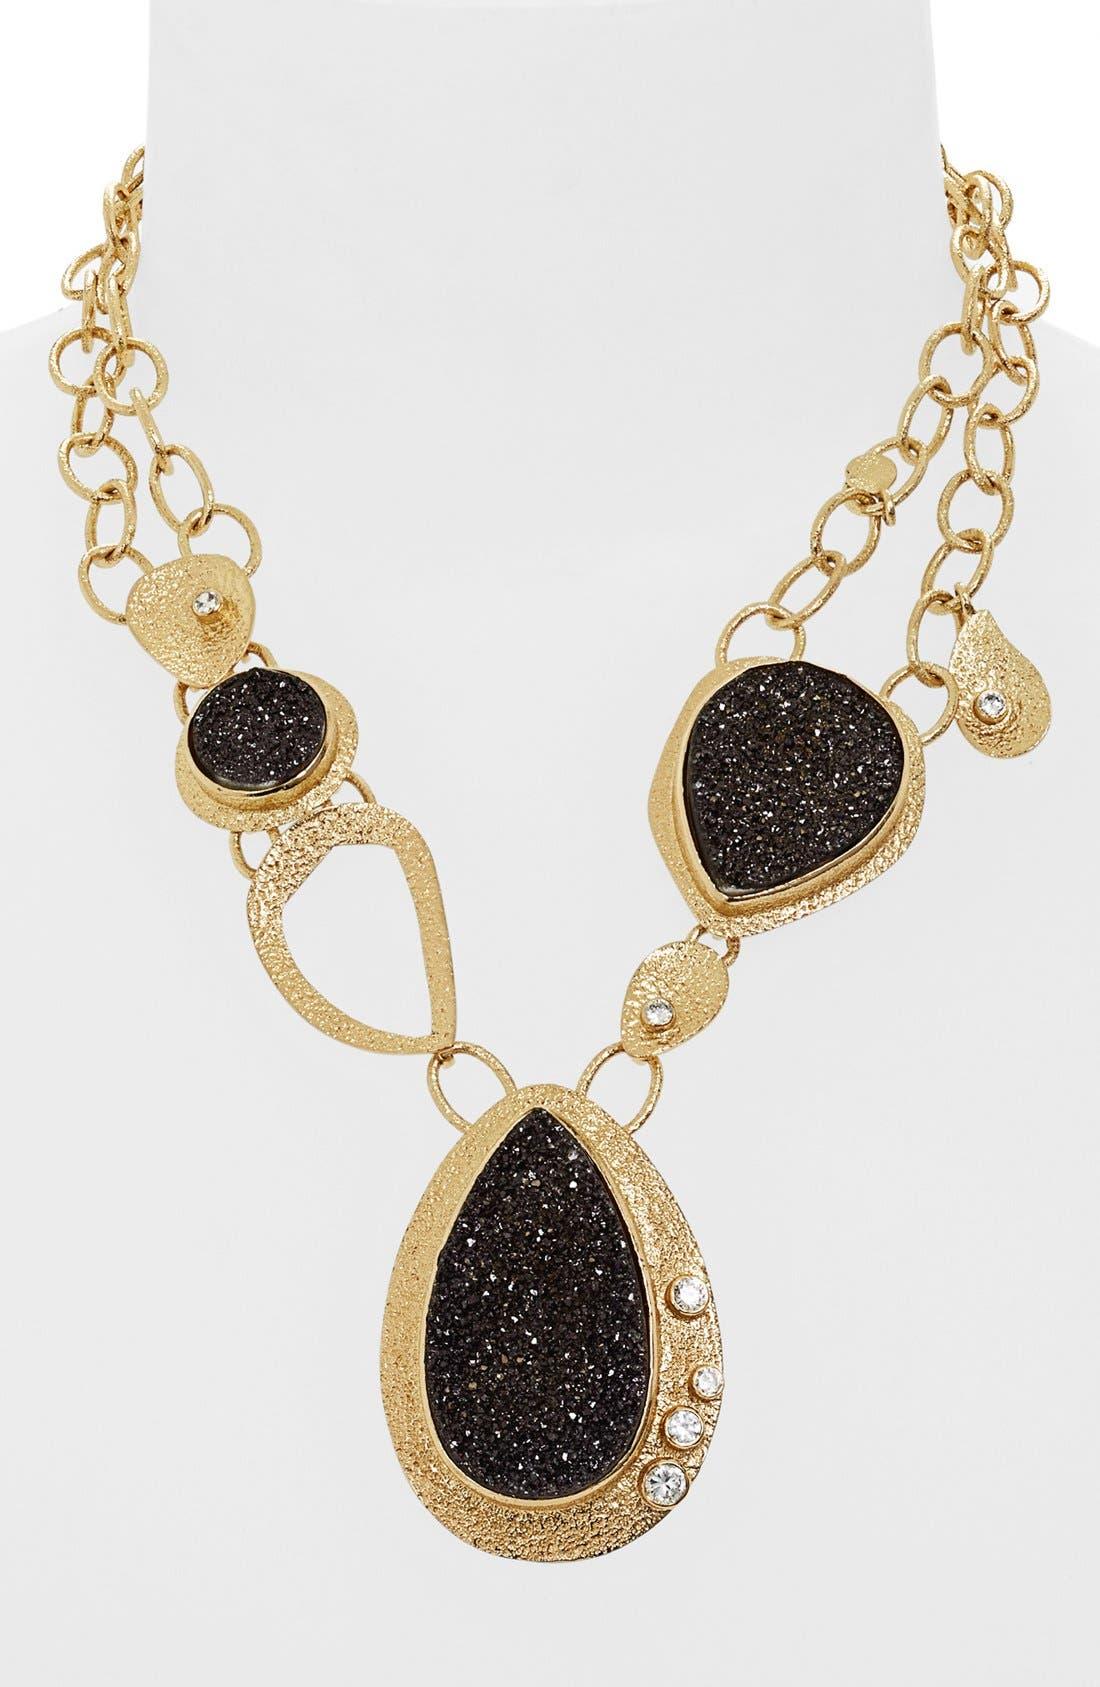 Main Image - Melinda Maria 'Gaia' Drusy Necklace